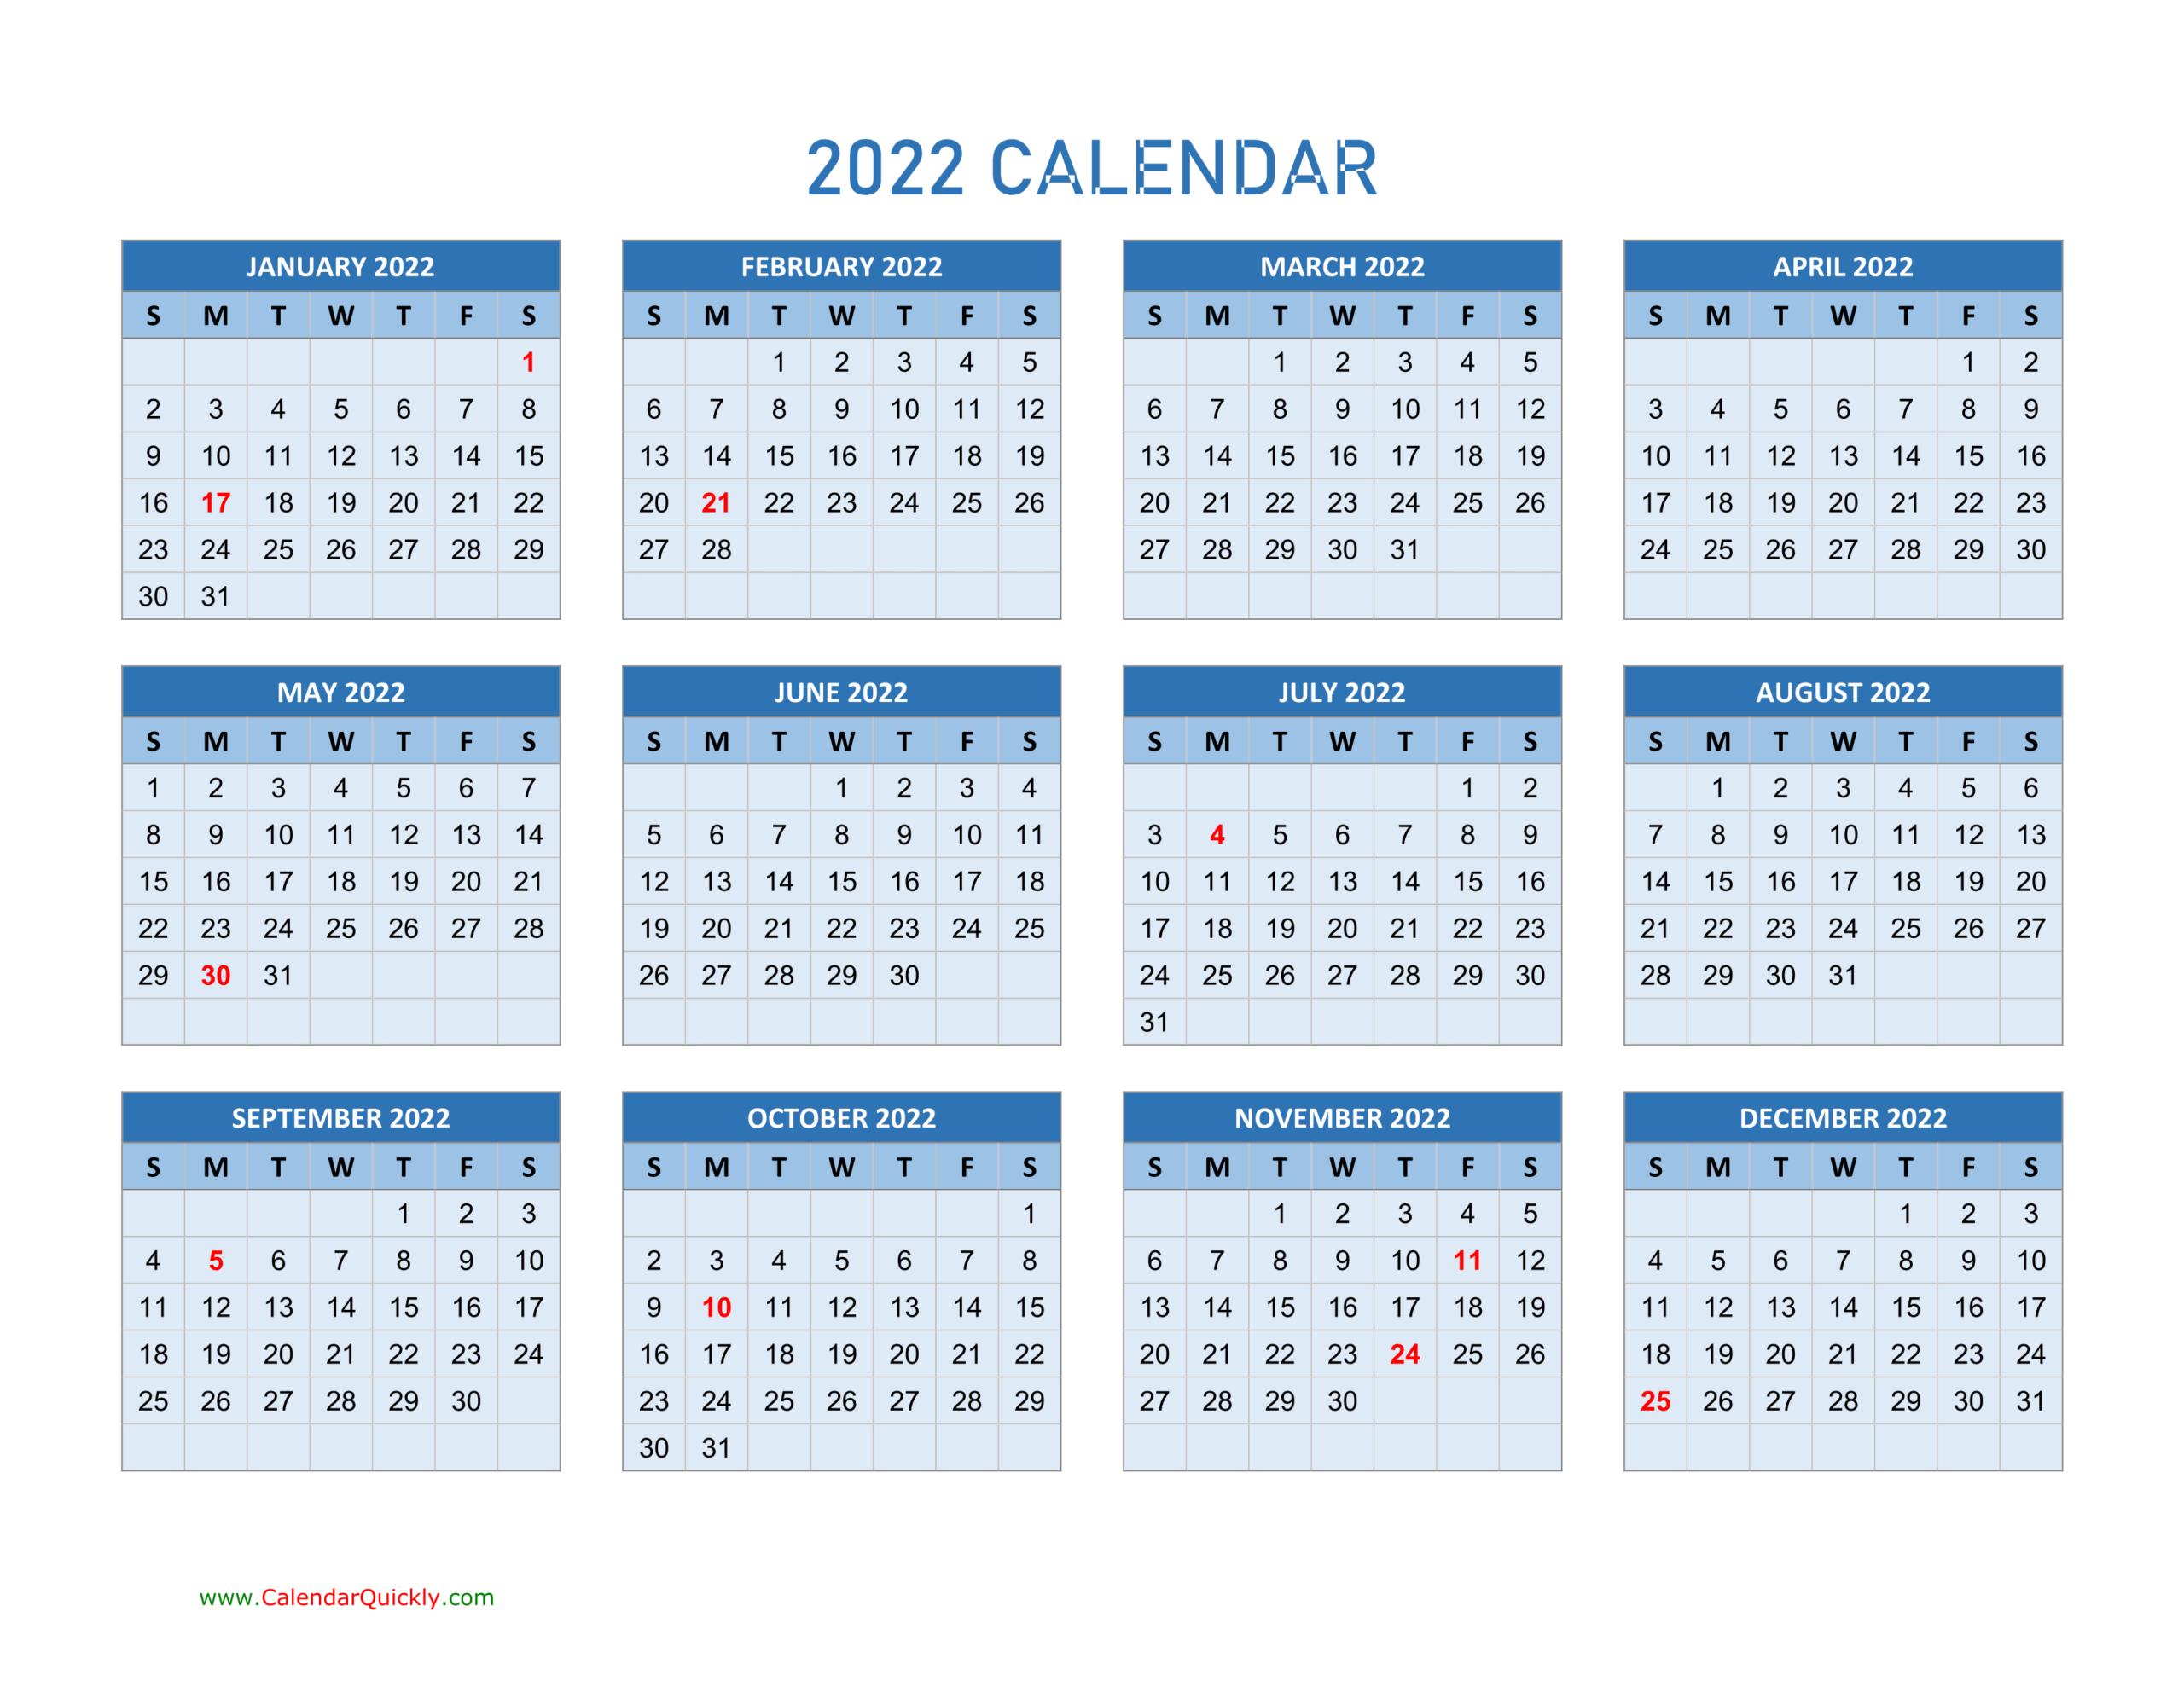 Year 2022 Calendars   Calendar Quickly inside January 2022 Calendar Half Page Print